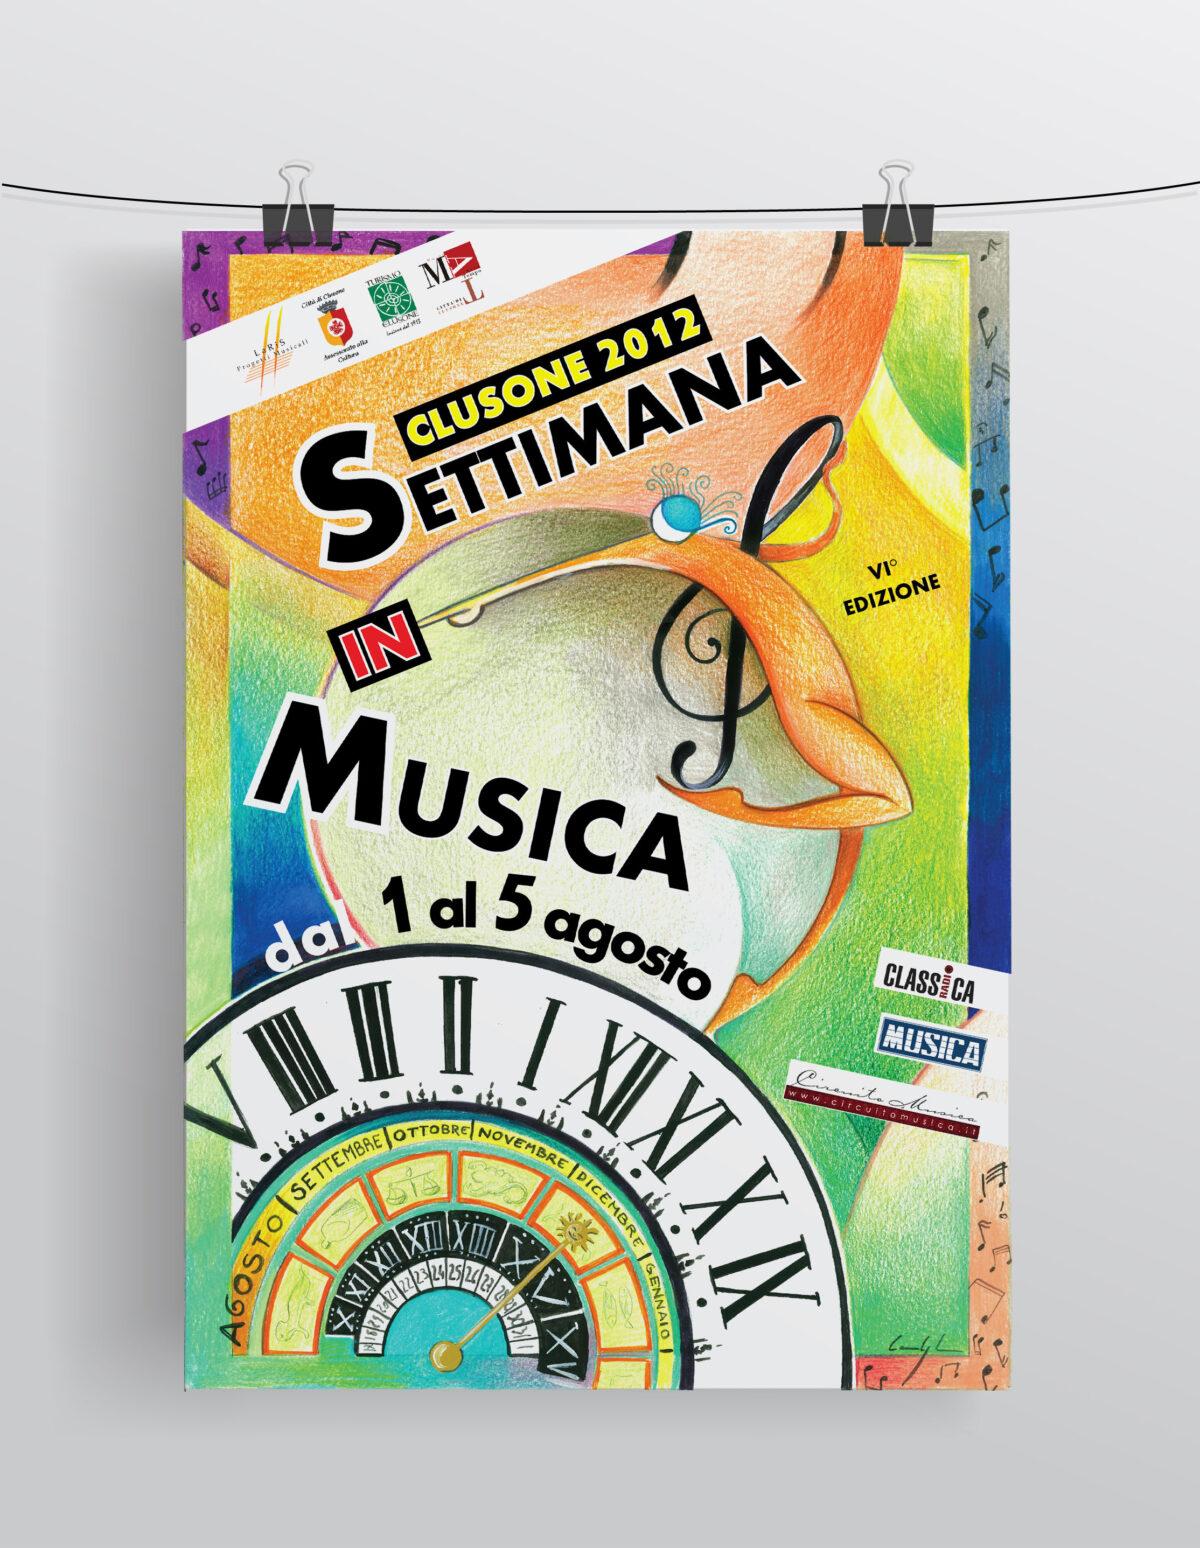 Settimana in musica 2012 - Locandina